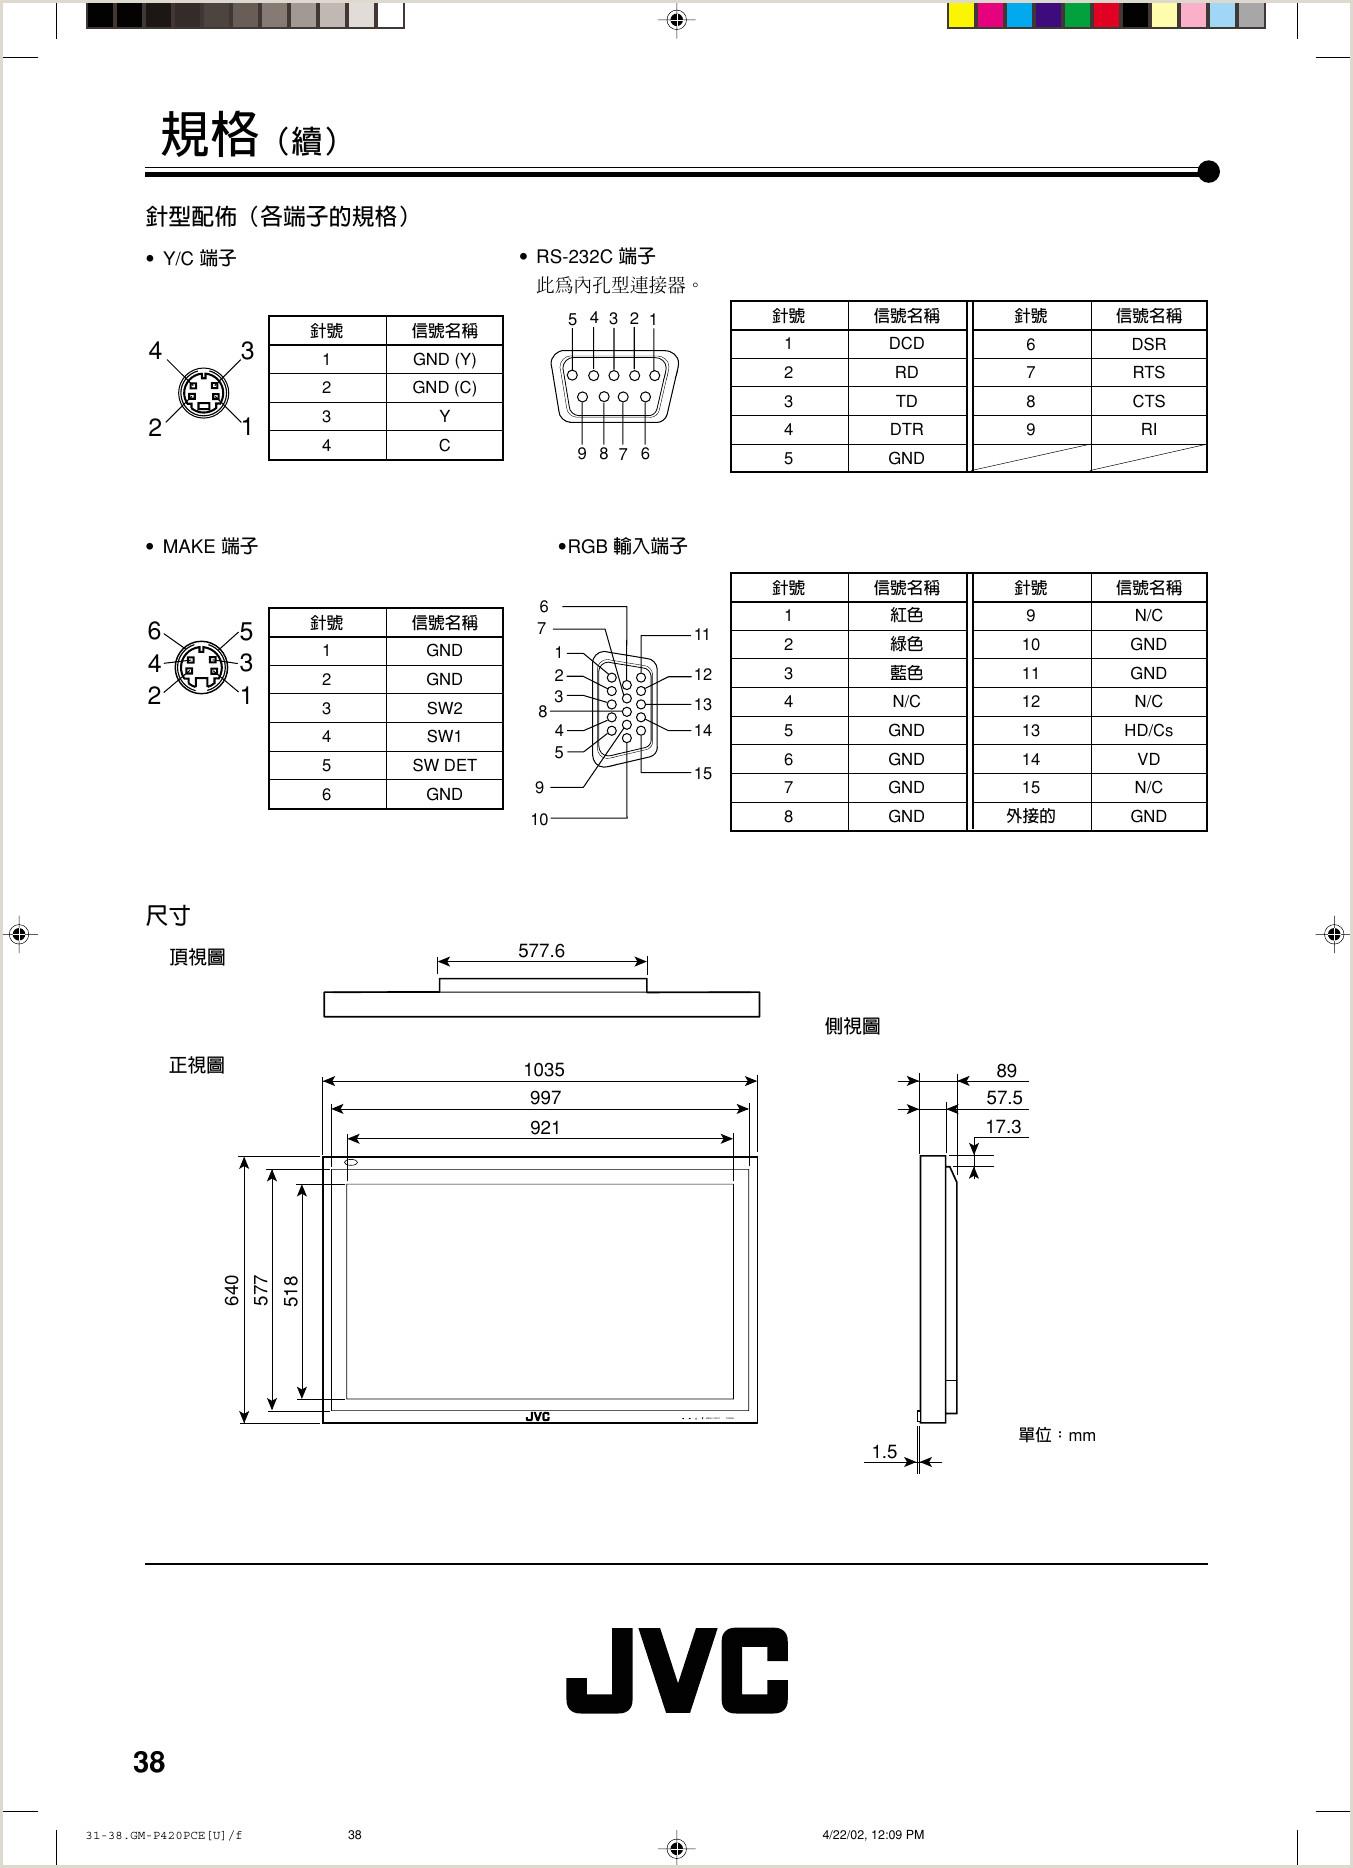 Descargar formato Hoja De Vida - 002 #hojadevida Jvc Gm P420pce P420e 420pce 421pce User Manual P420pce